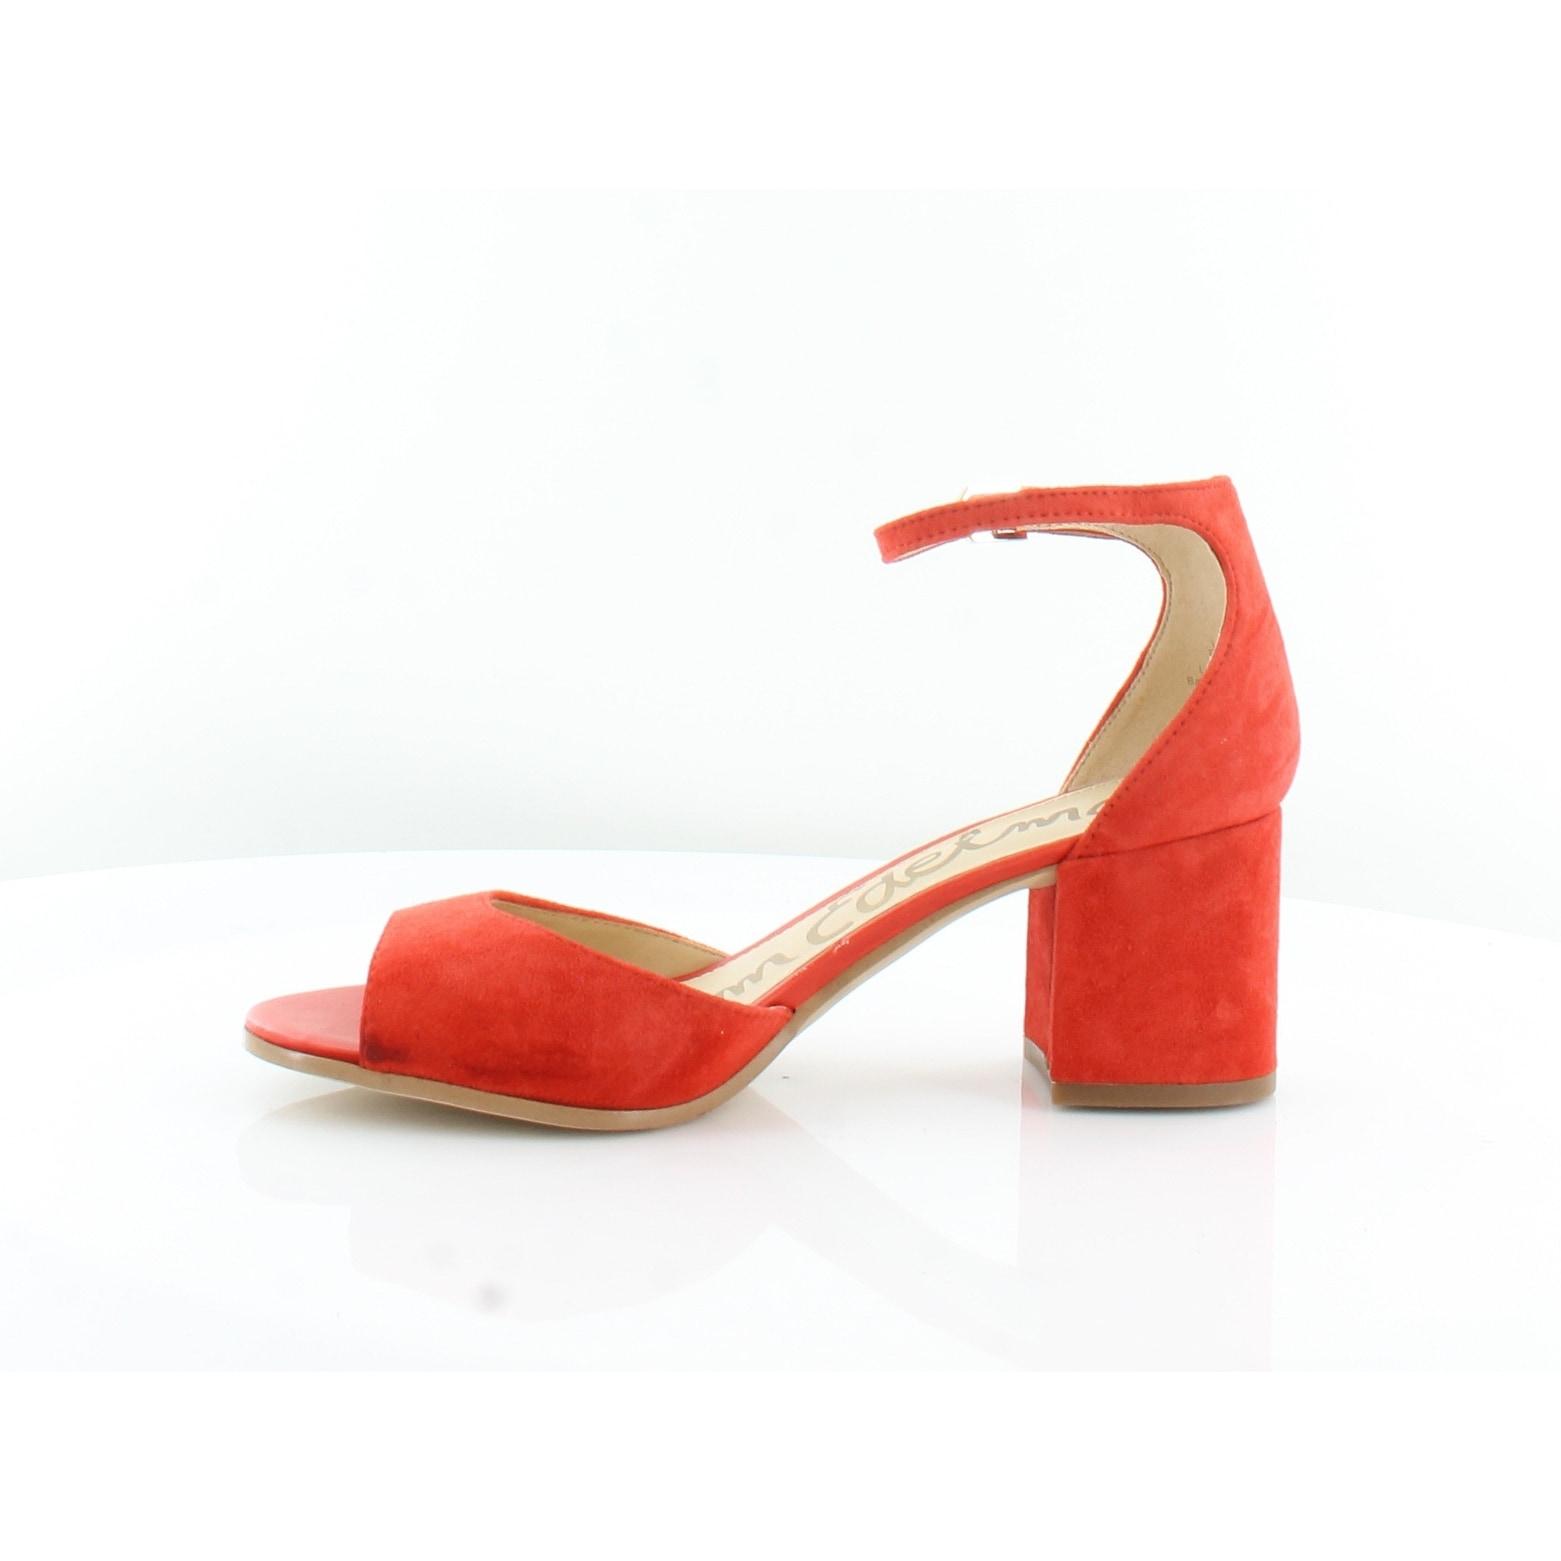 41918b8c3bcb Shop Sam Edelman Susie Women s Heels Blood Orng - 10 - Free Shipping Today  - Overstock - 21551689